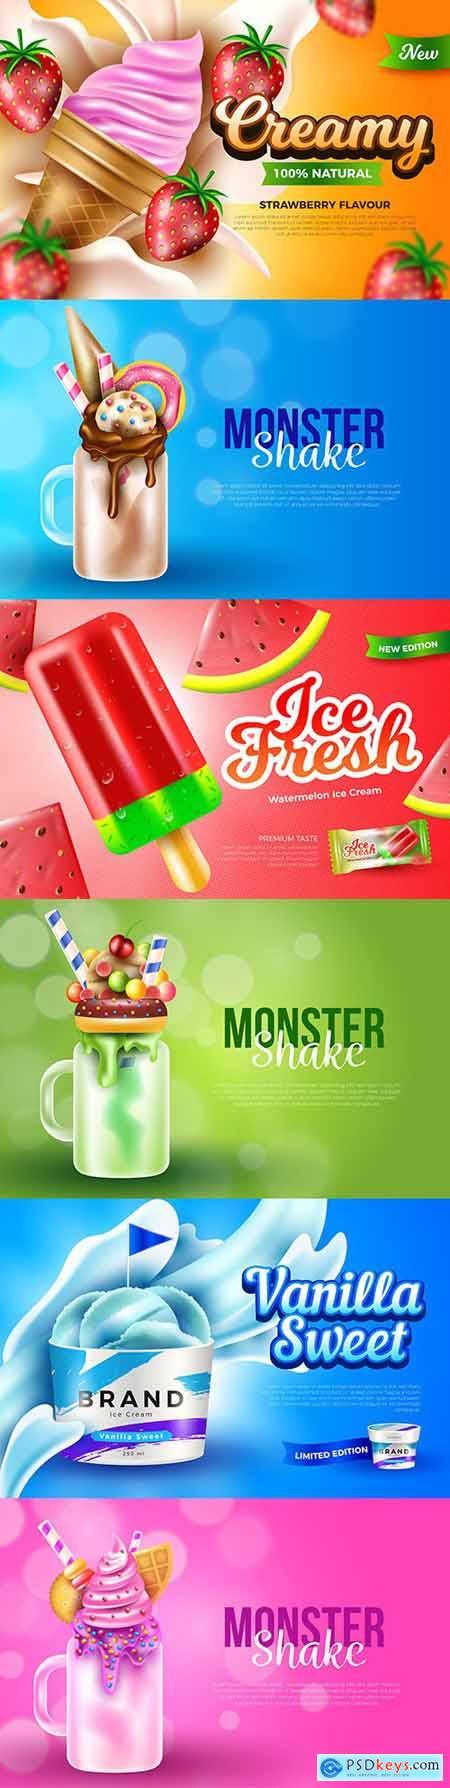 Ice cream and monster shake poster advertising design